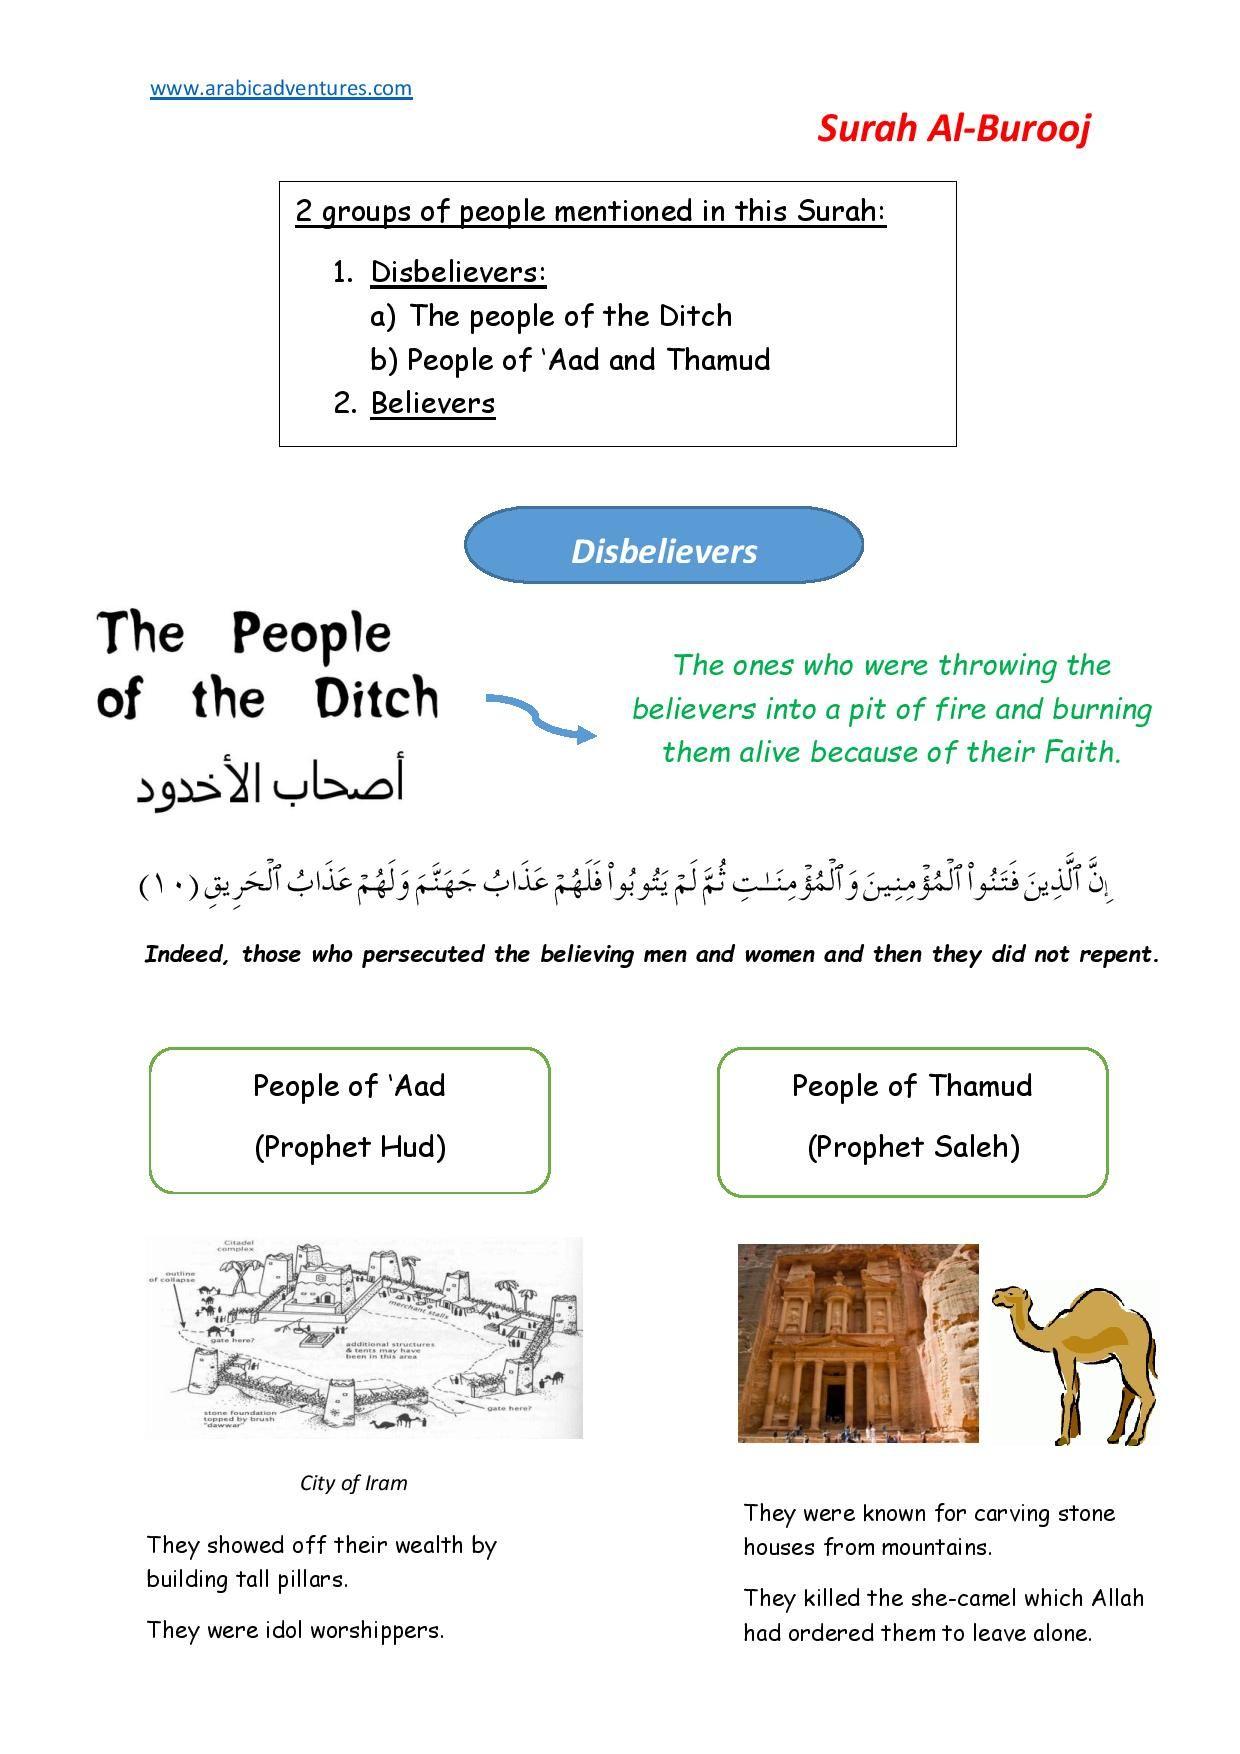 Surah Al Burooj Tafsir For Kids Handout Sheet 1 Free At Abicadventures